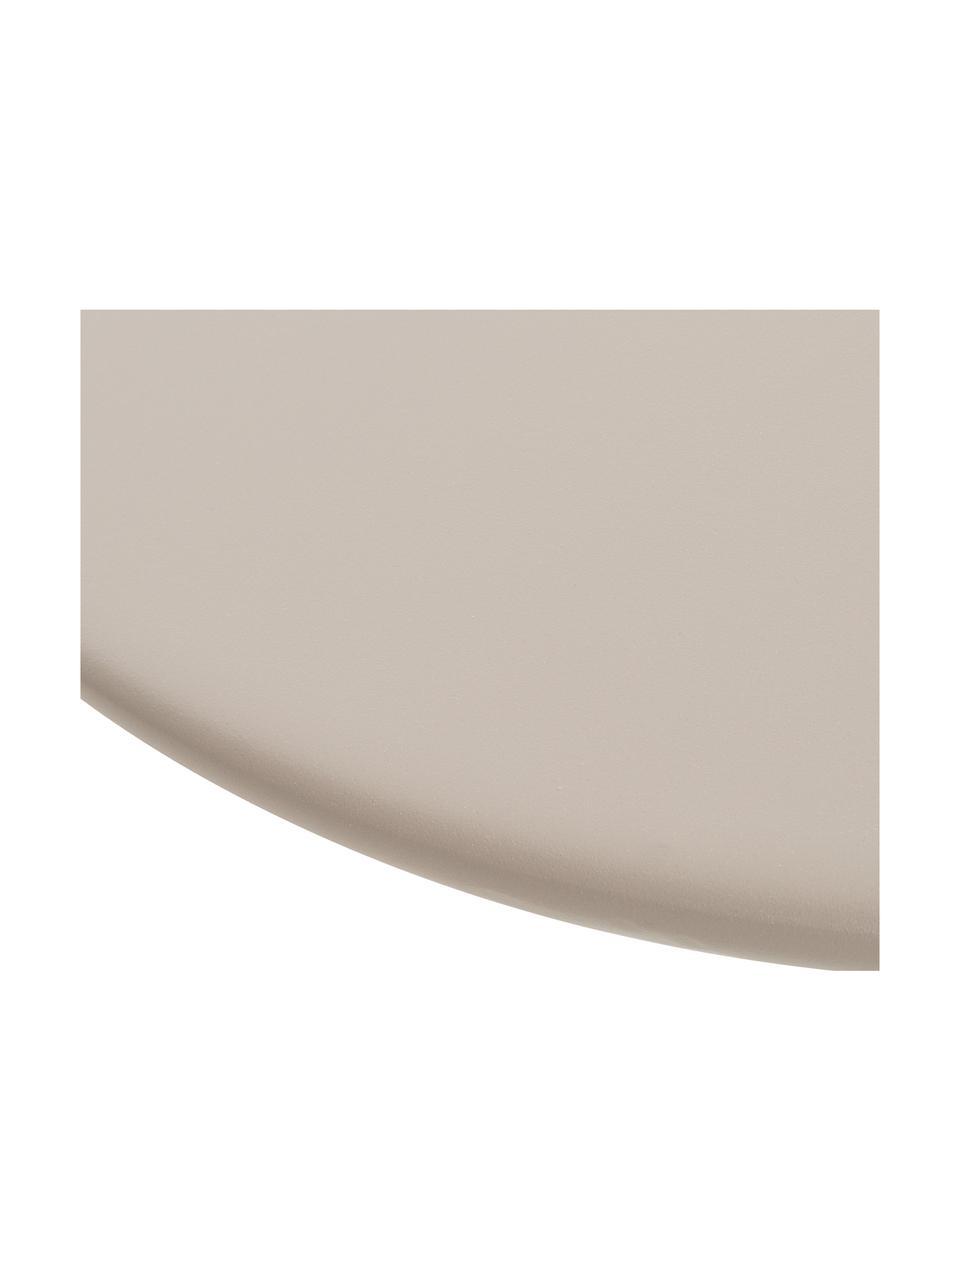 Tuintafel Sunderland, Staal, gegalvaniseerd verzinkt, poedercoating, Taupe, Ø 65 x H 40 cm